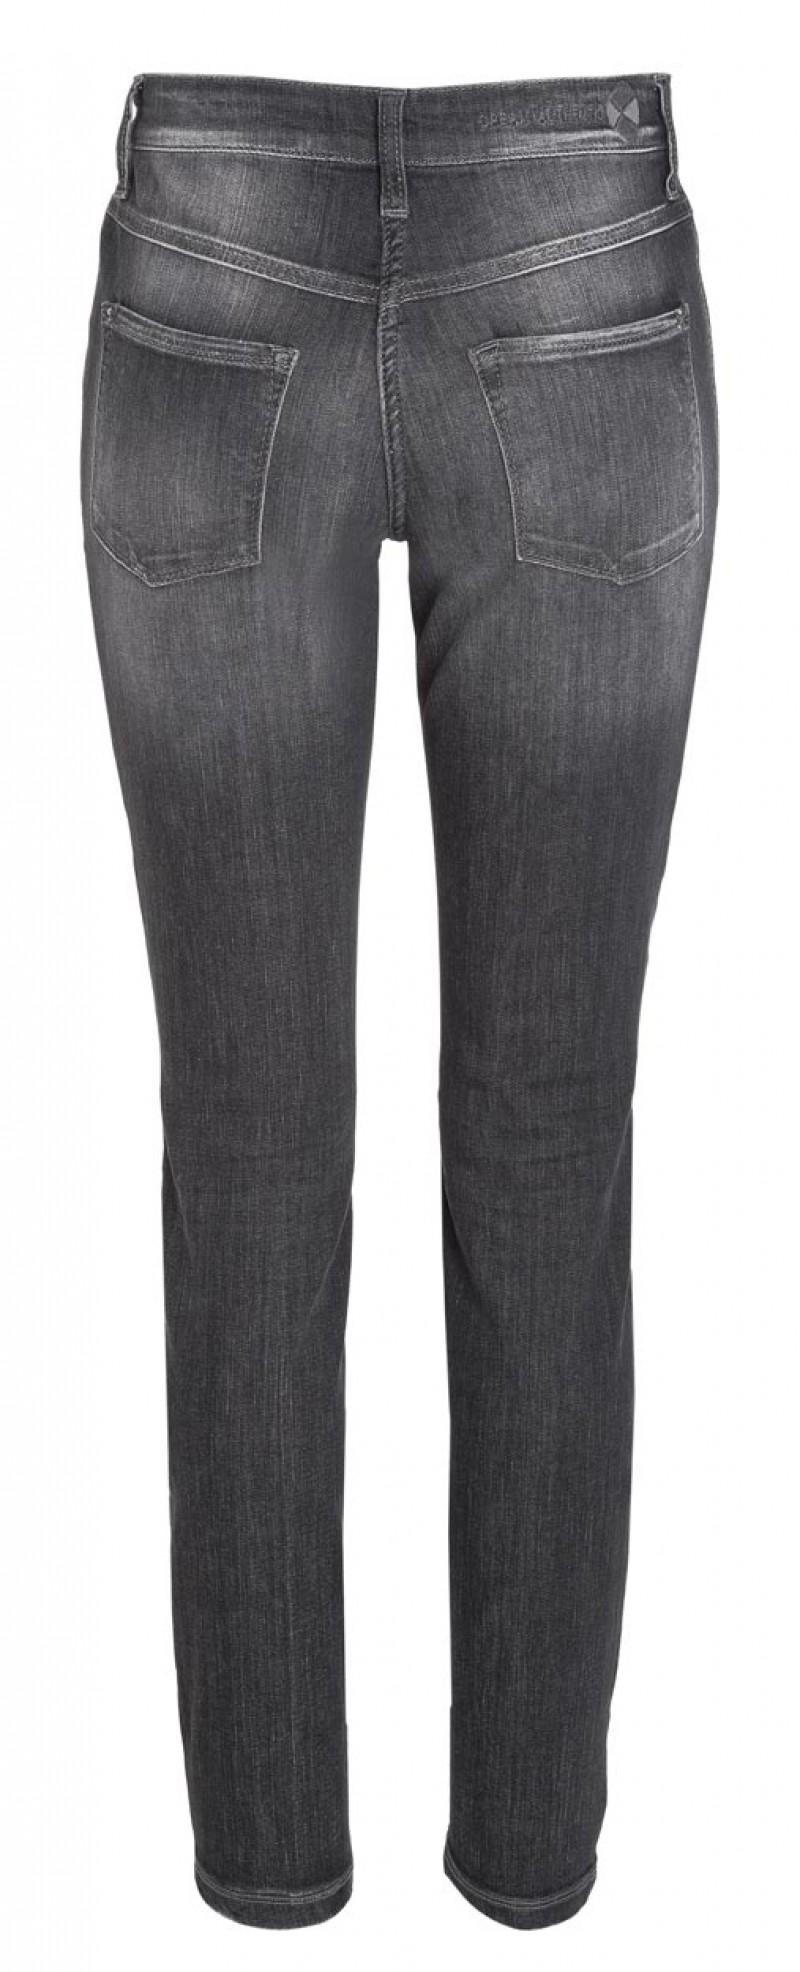 MAC DREAM SKINNY - AUTHENTIC Jeans - Black Authentic Used